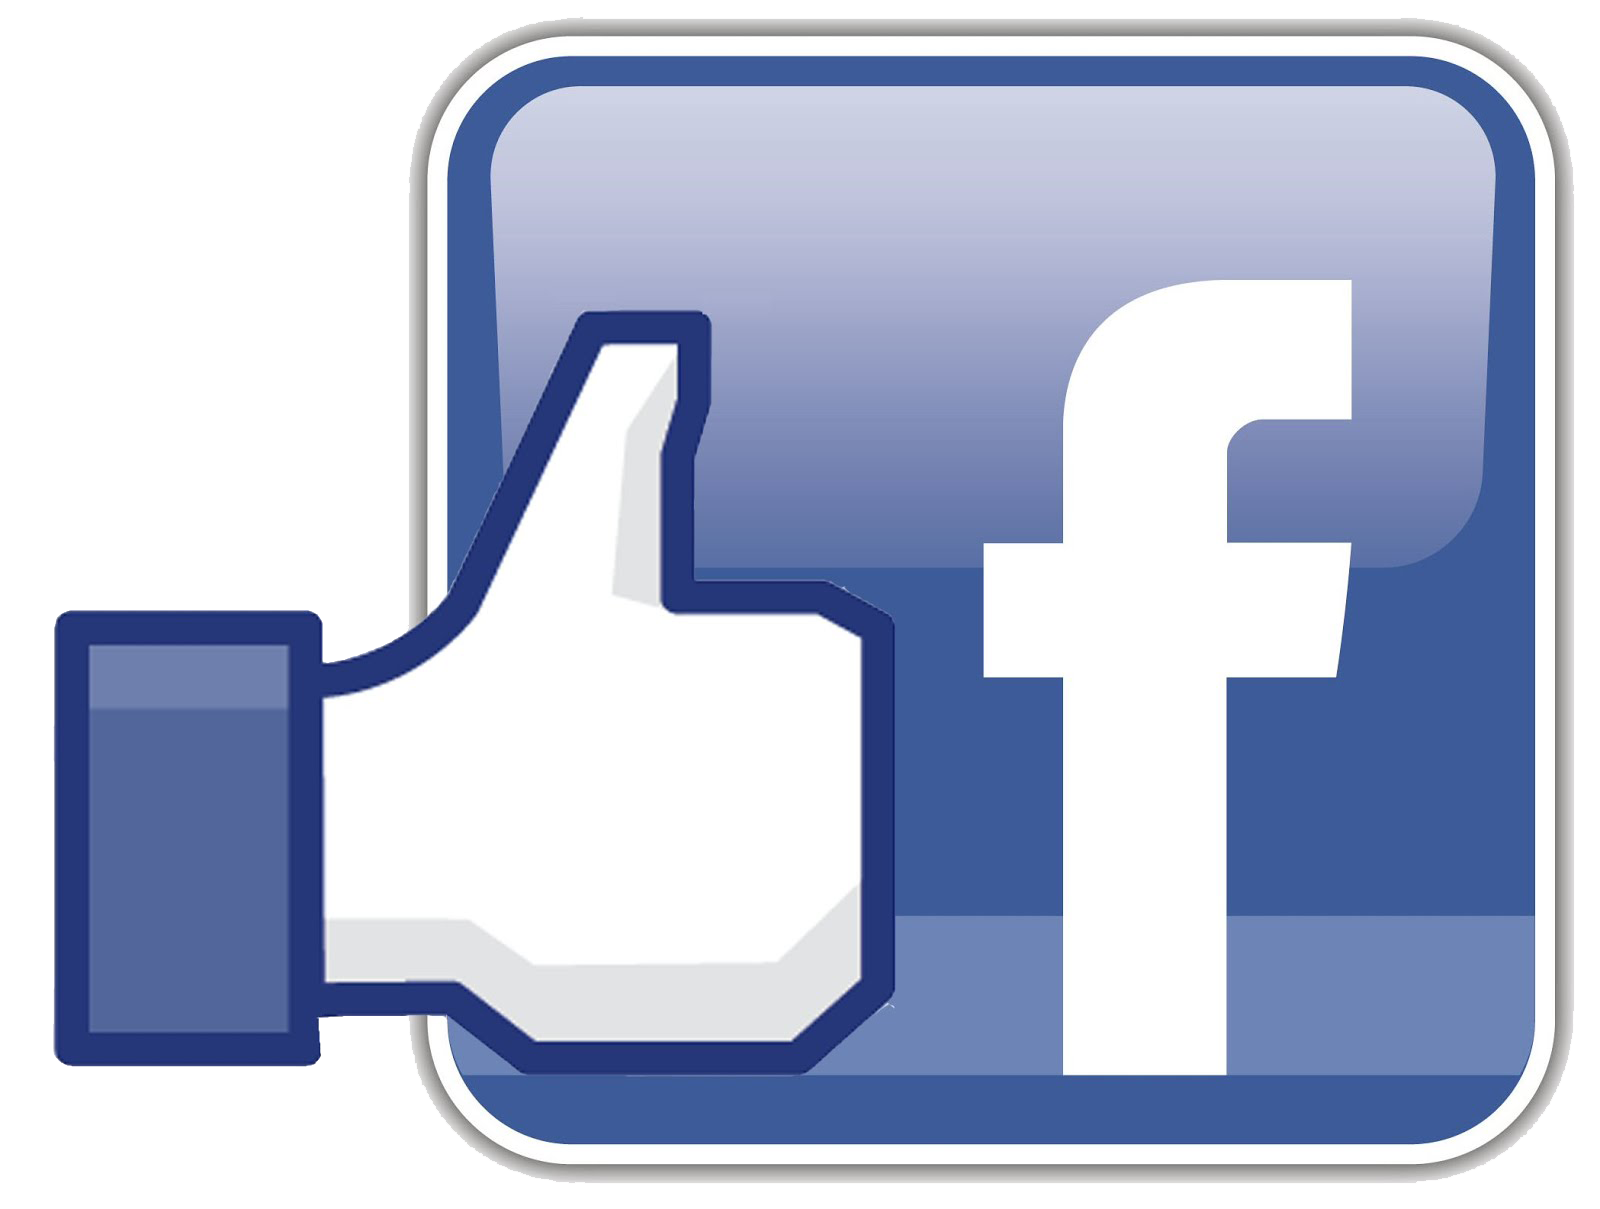 Facebook Logo Png 2 Image #1-Facebook Logo Png 2 image #1-12